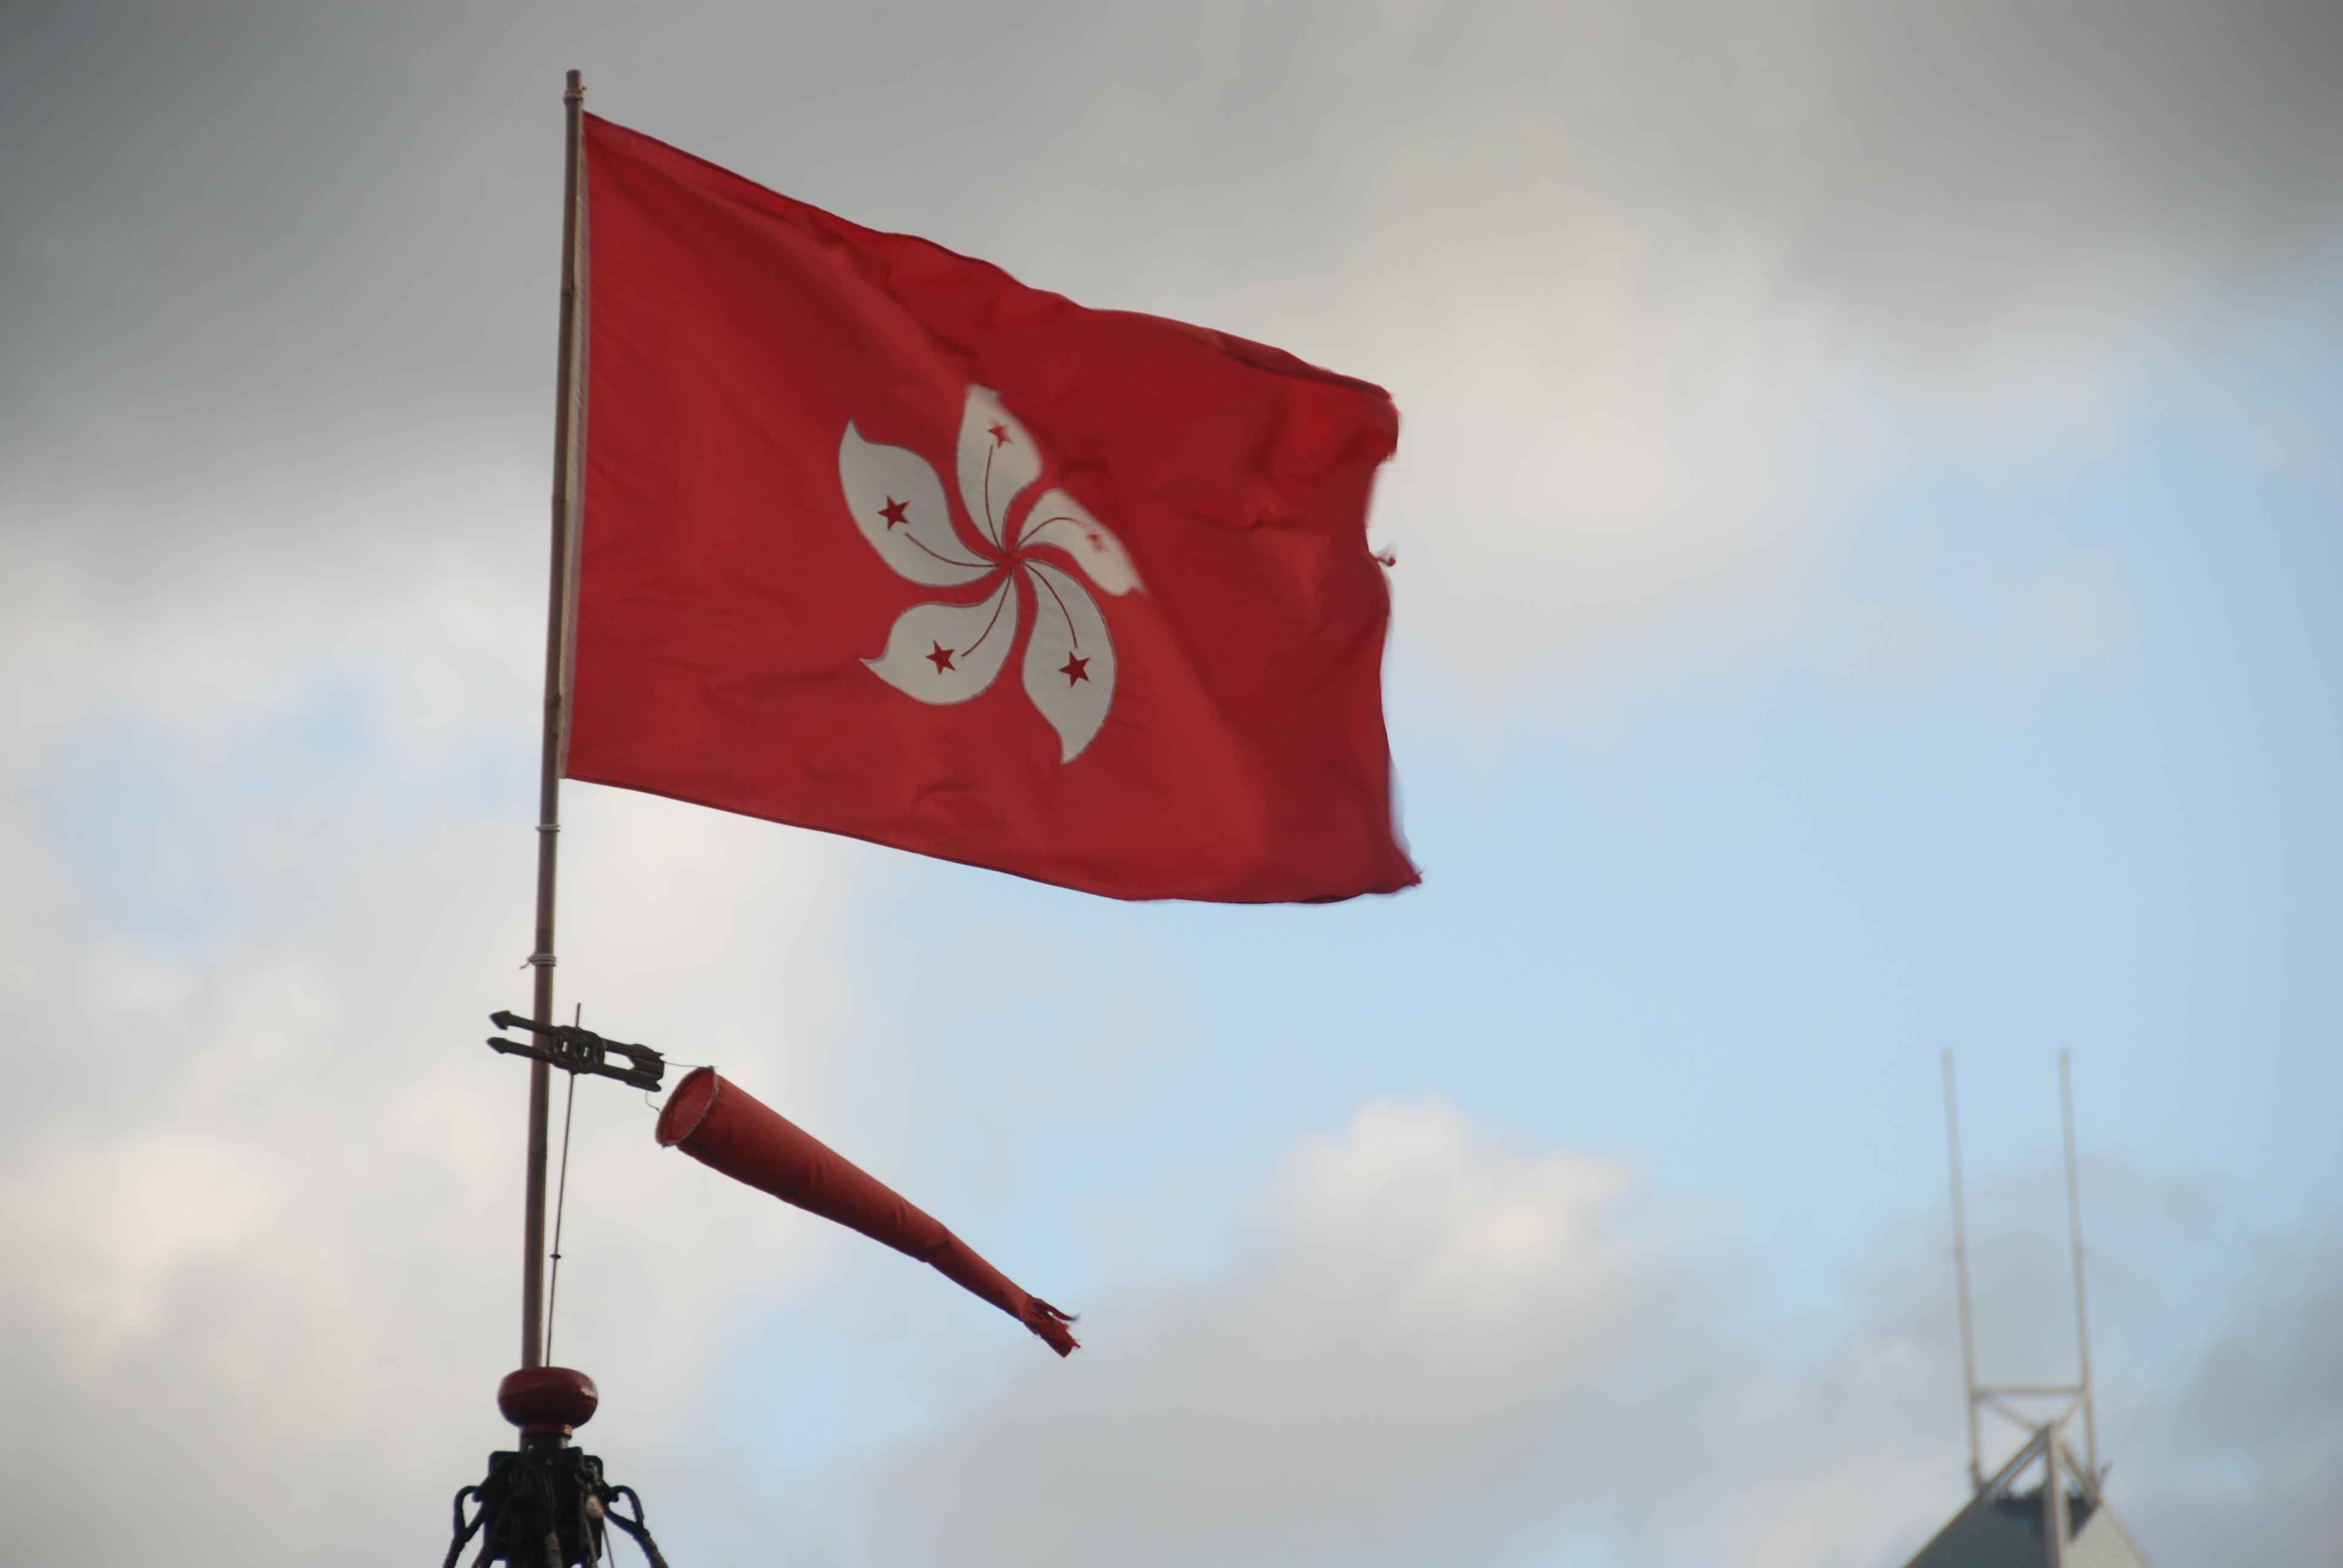 File:HONG KONG FLAG.jpg - Wikimedia Commons